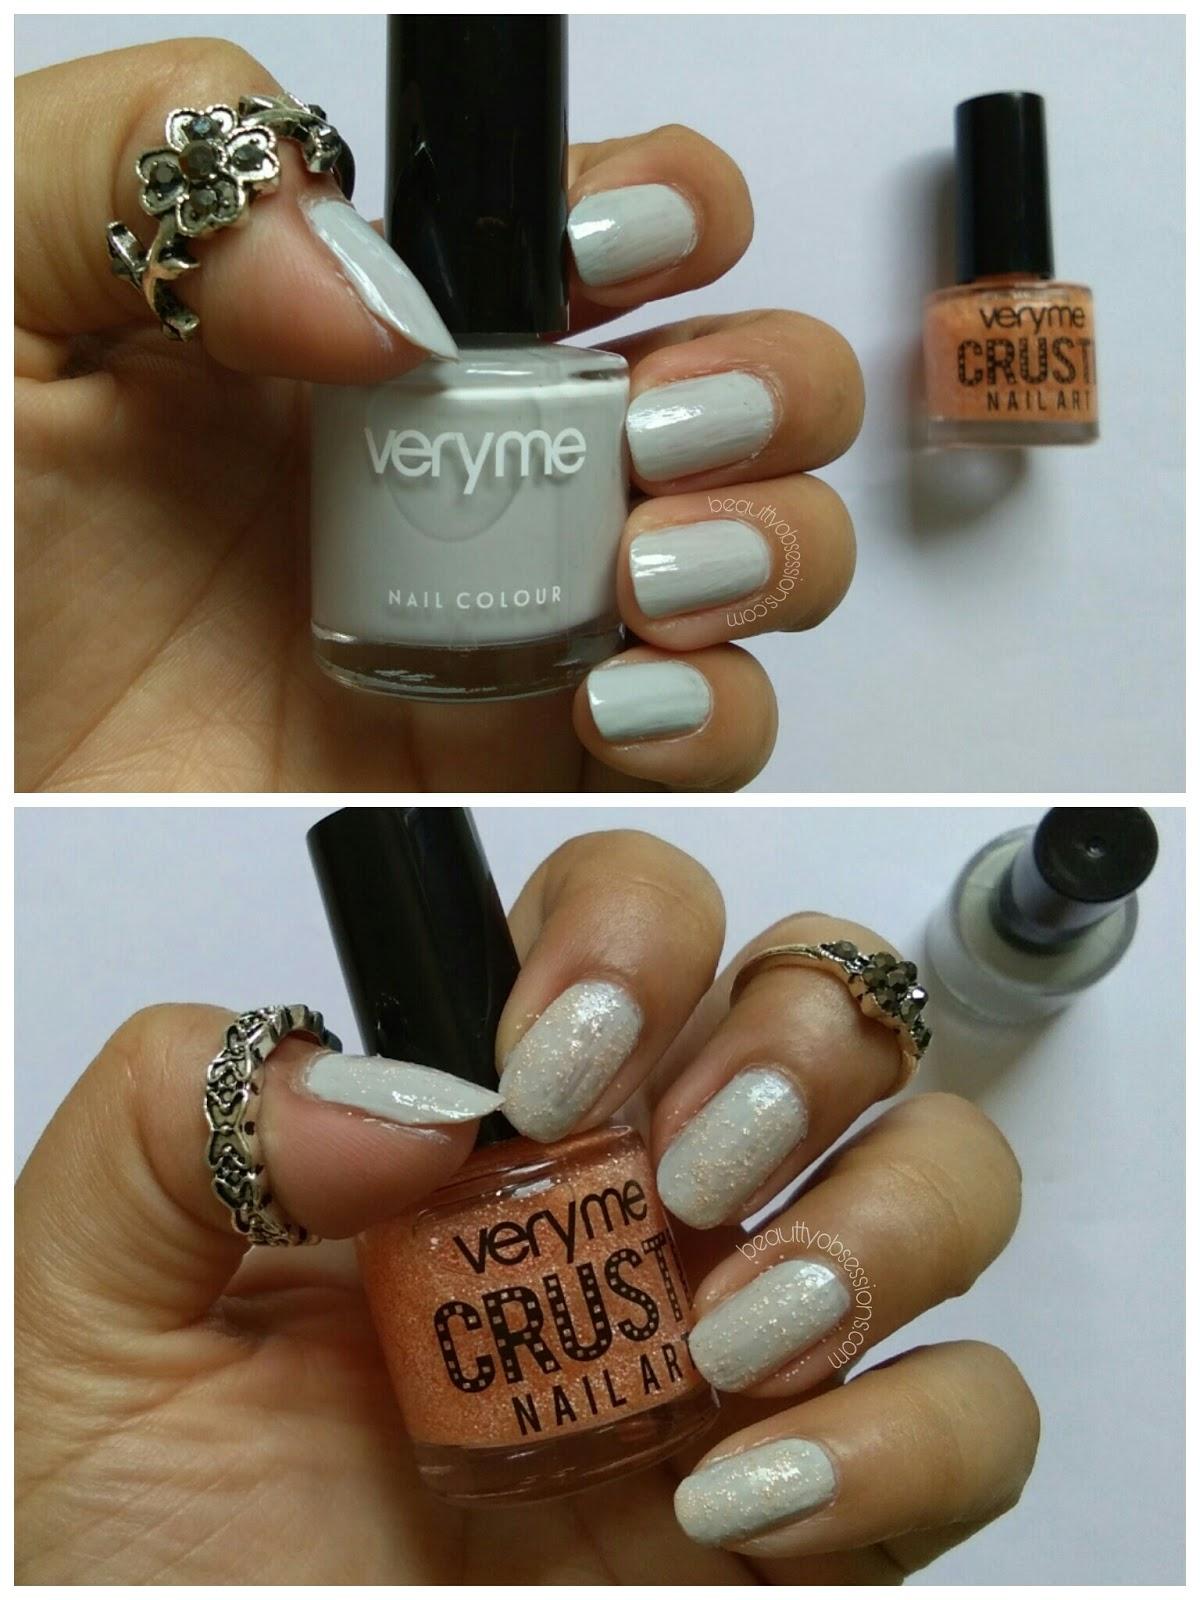 Oriflame Very Me \'Crusti Nailart \' Nail Polishes Review - Beauty ...